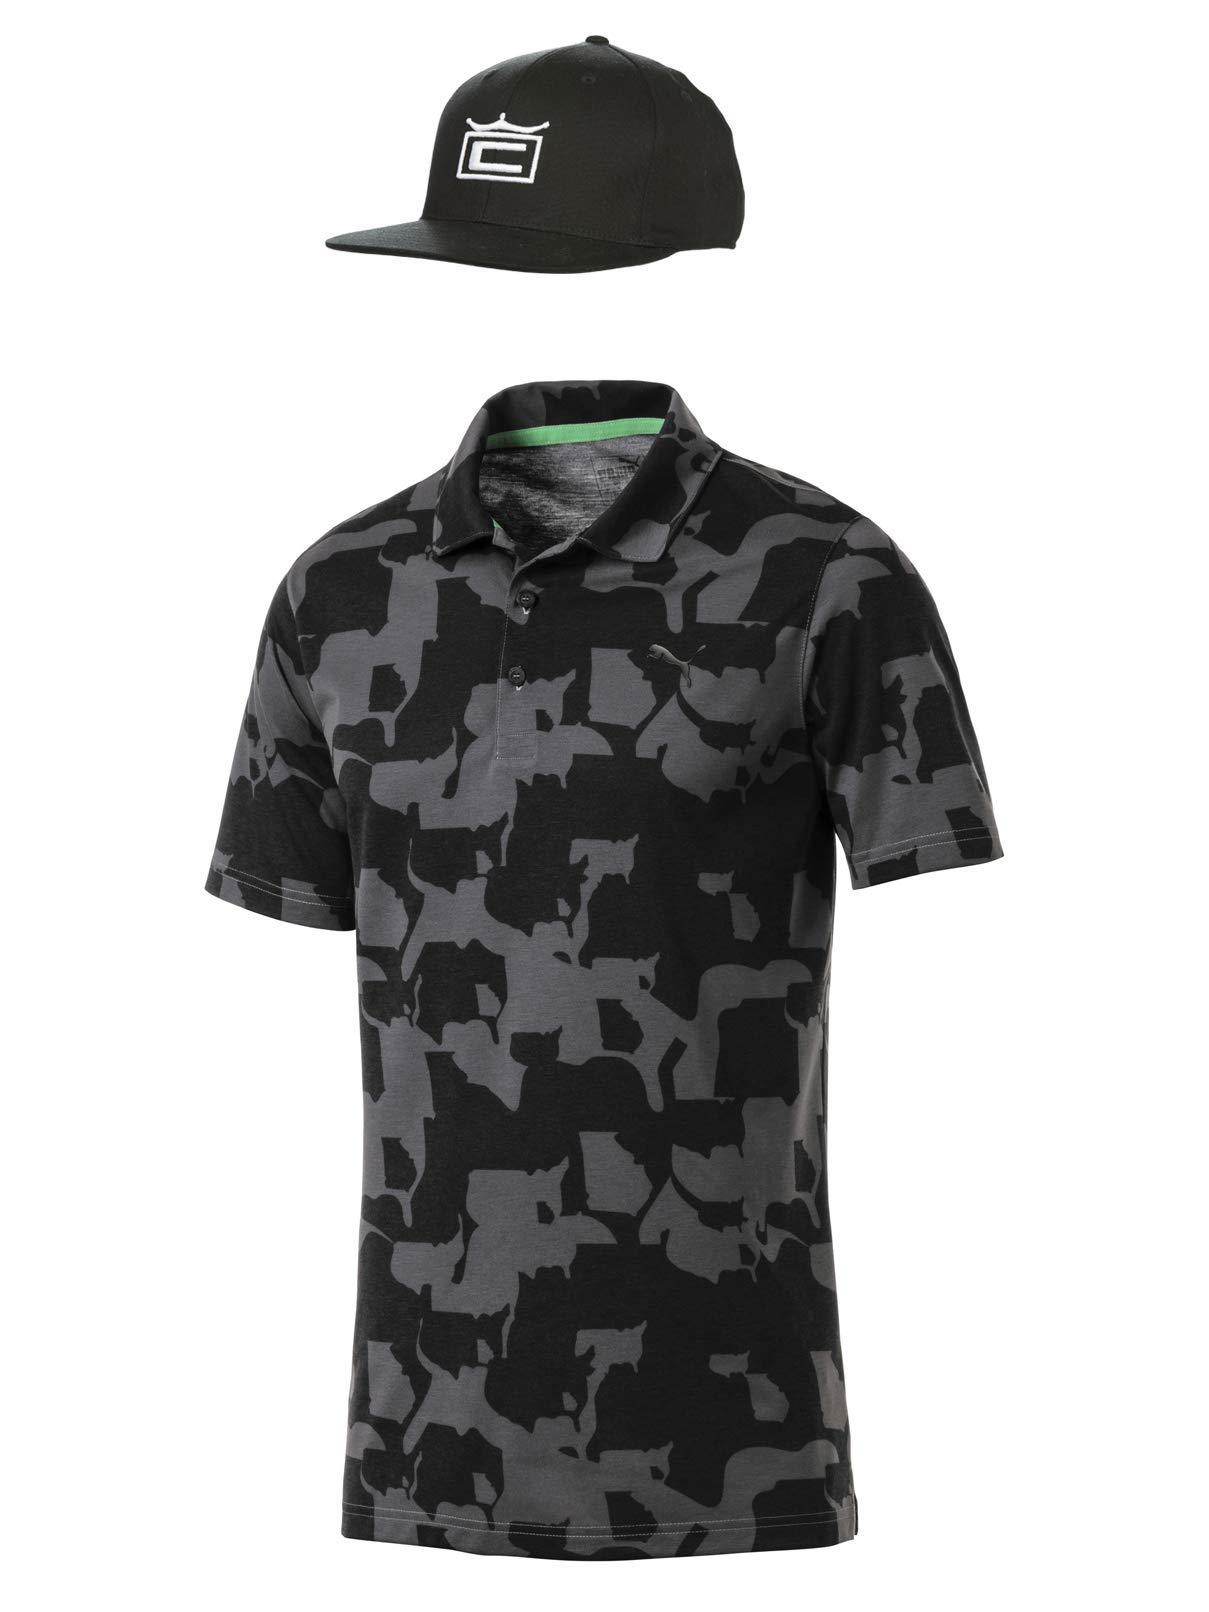 Rickie Fowler Masters Puma Golf Polo & Hat Bundle (2019)   Puma Union Camo Polo & Cobra Tour Crown 110 Snapback (Iron Gate/Black, Medium)